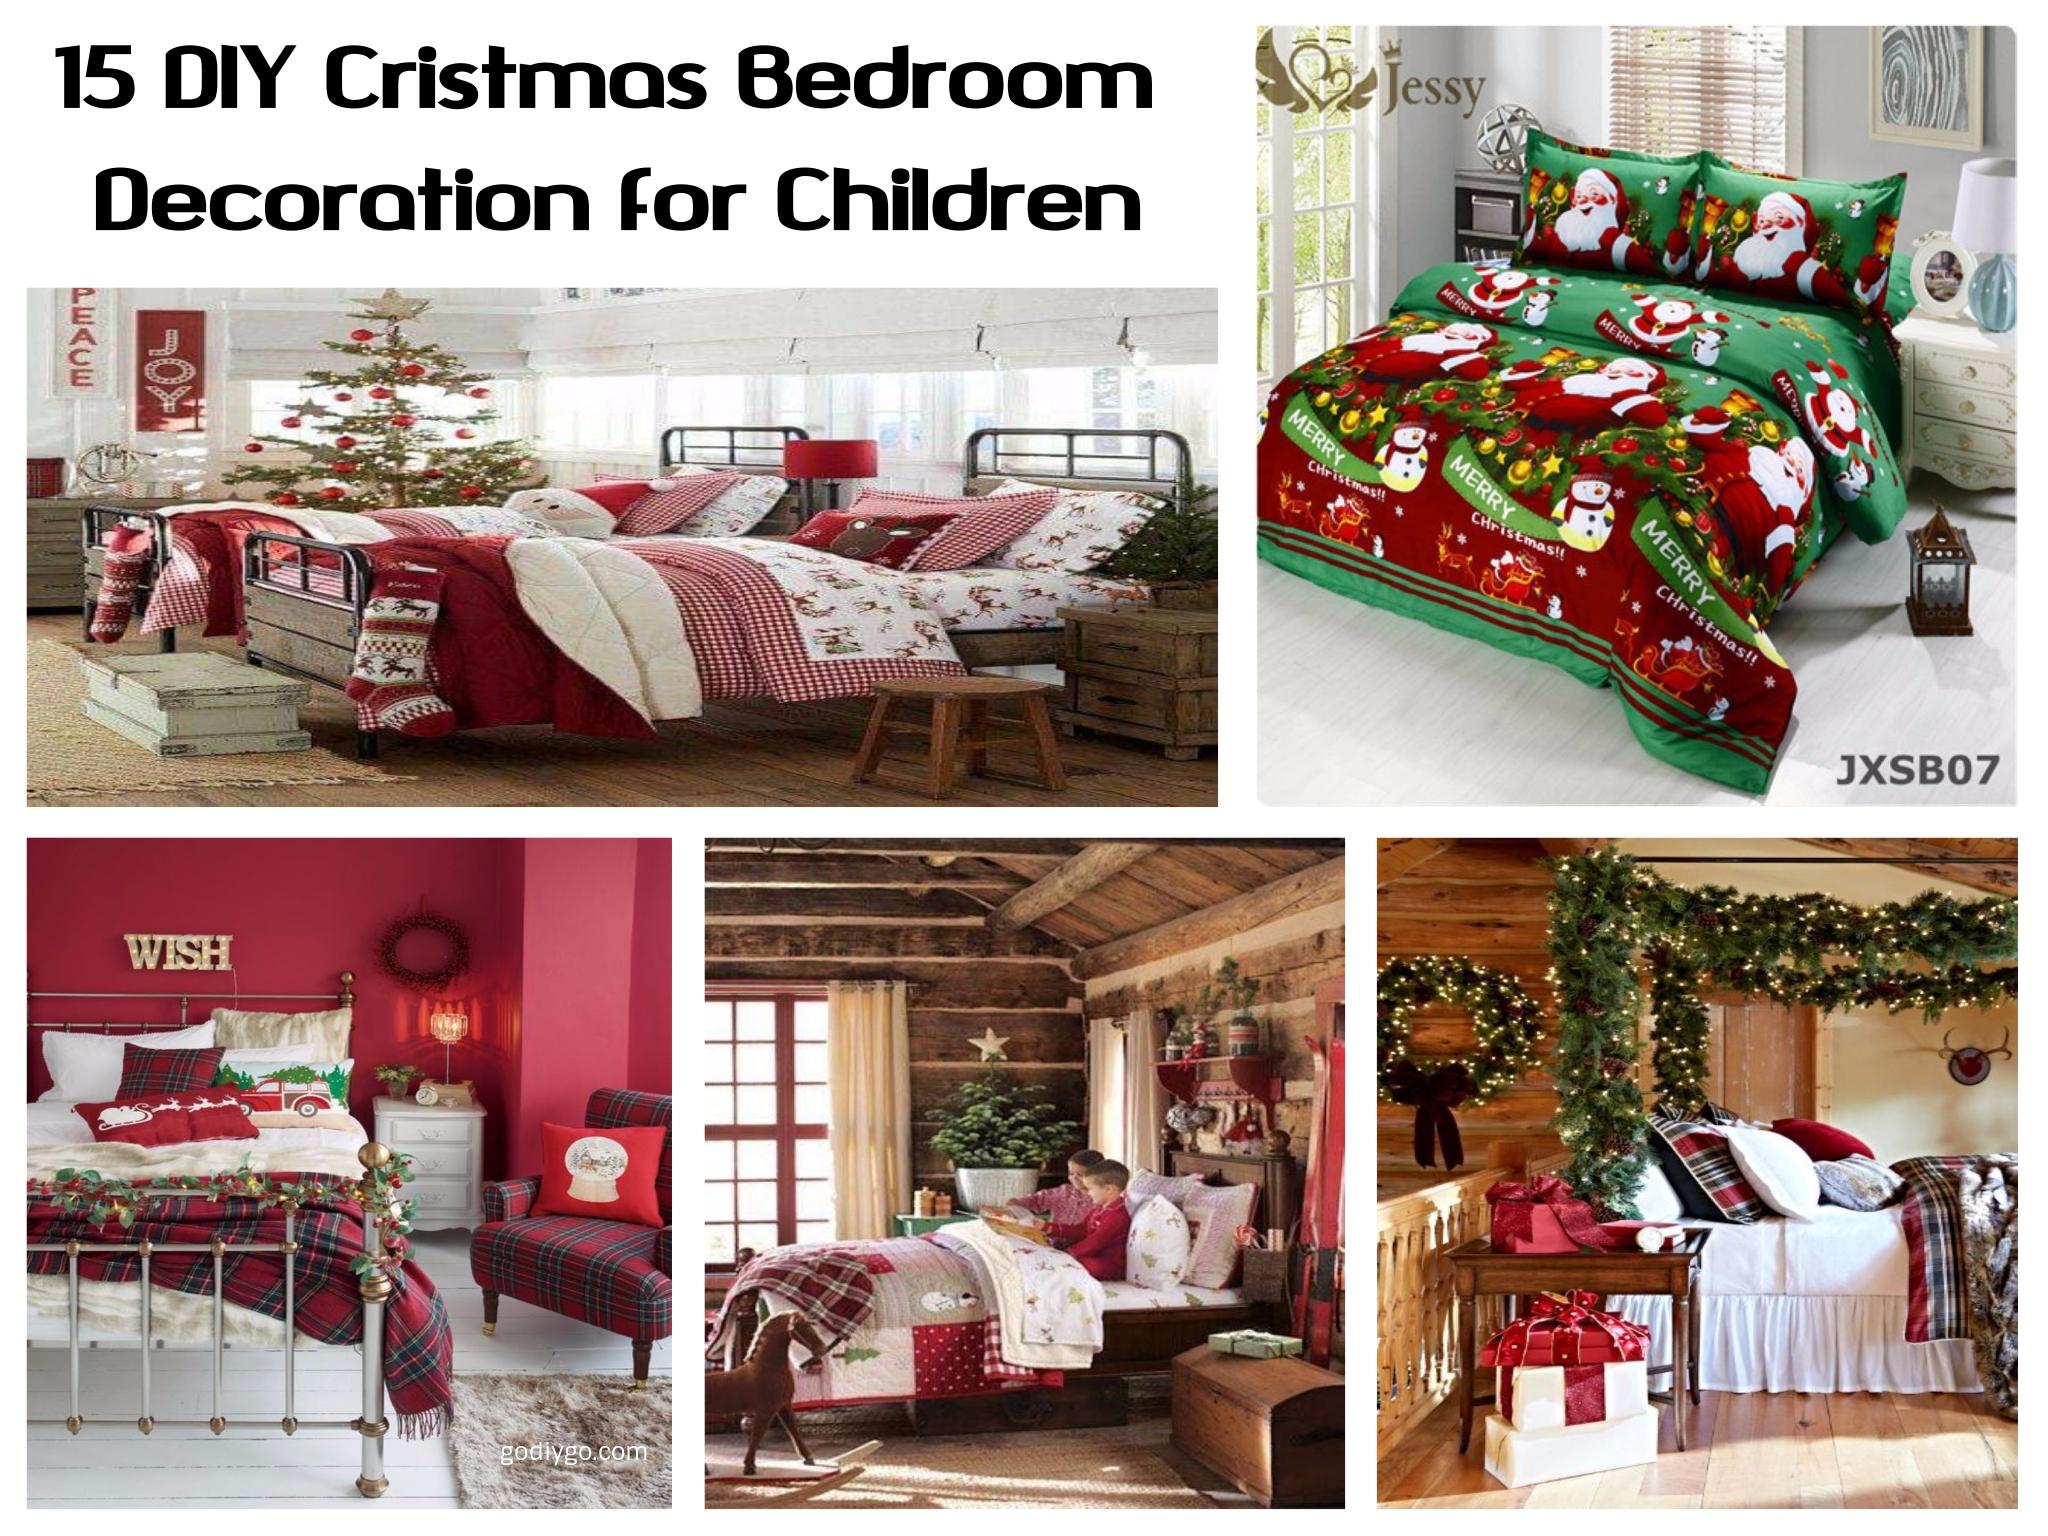 15 DIY Christmas Bedroom Decorations for Children & 15 DIY Christmas Bedroom Decorations for Children - GODIYGO.COM